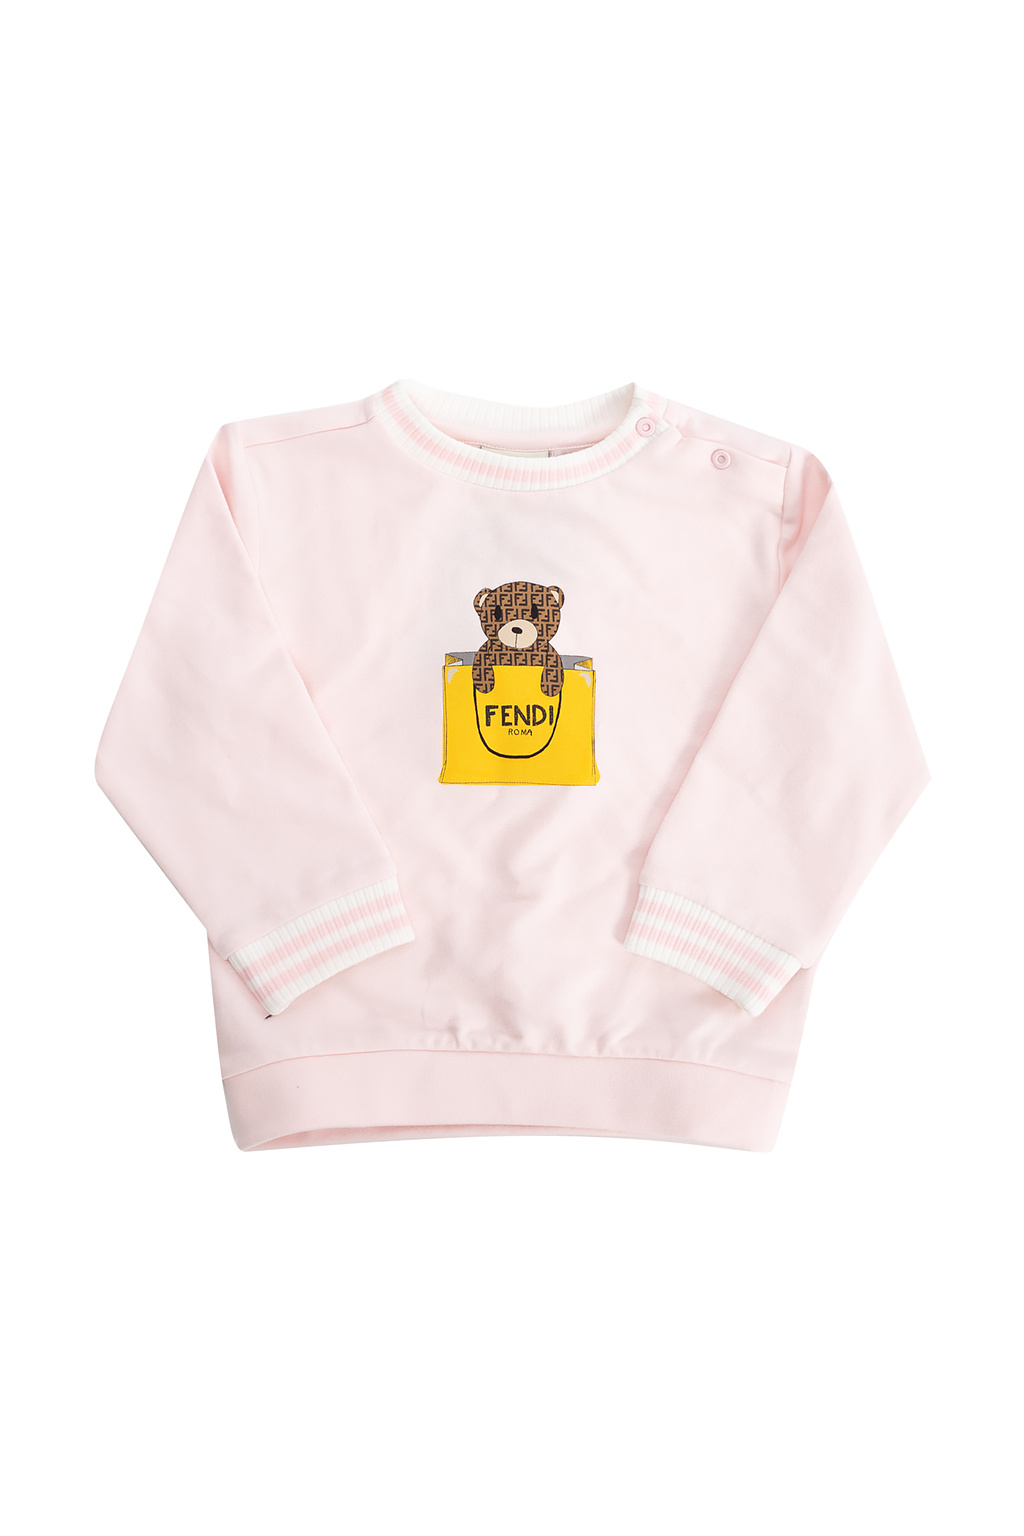 Fendi Kids Bluza z nadrukiem